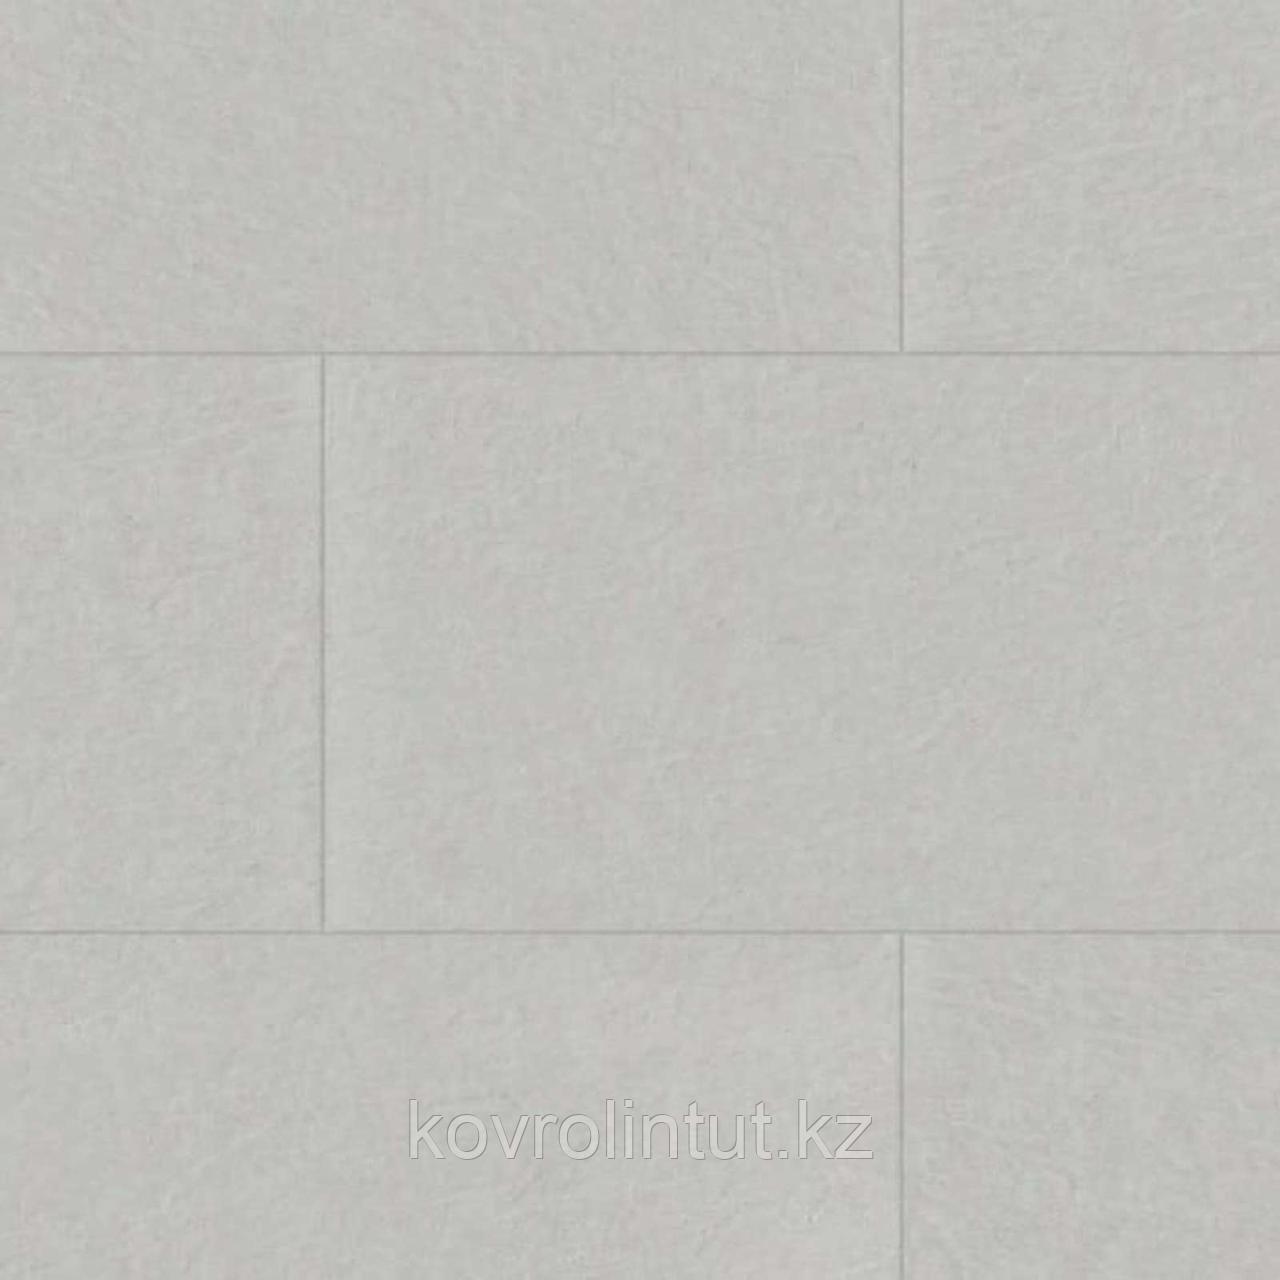 Плитка ПВХ клеевая Arbiton Aroq Soho Concrete DA118